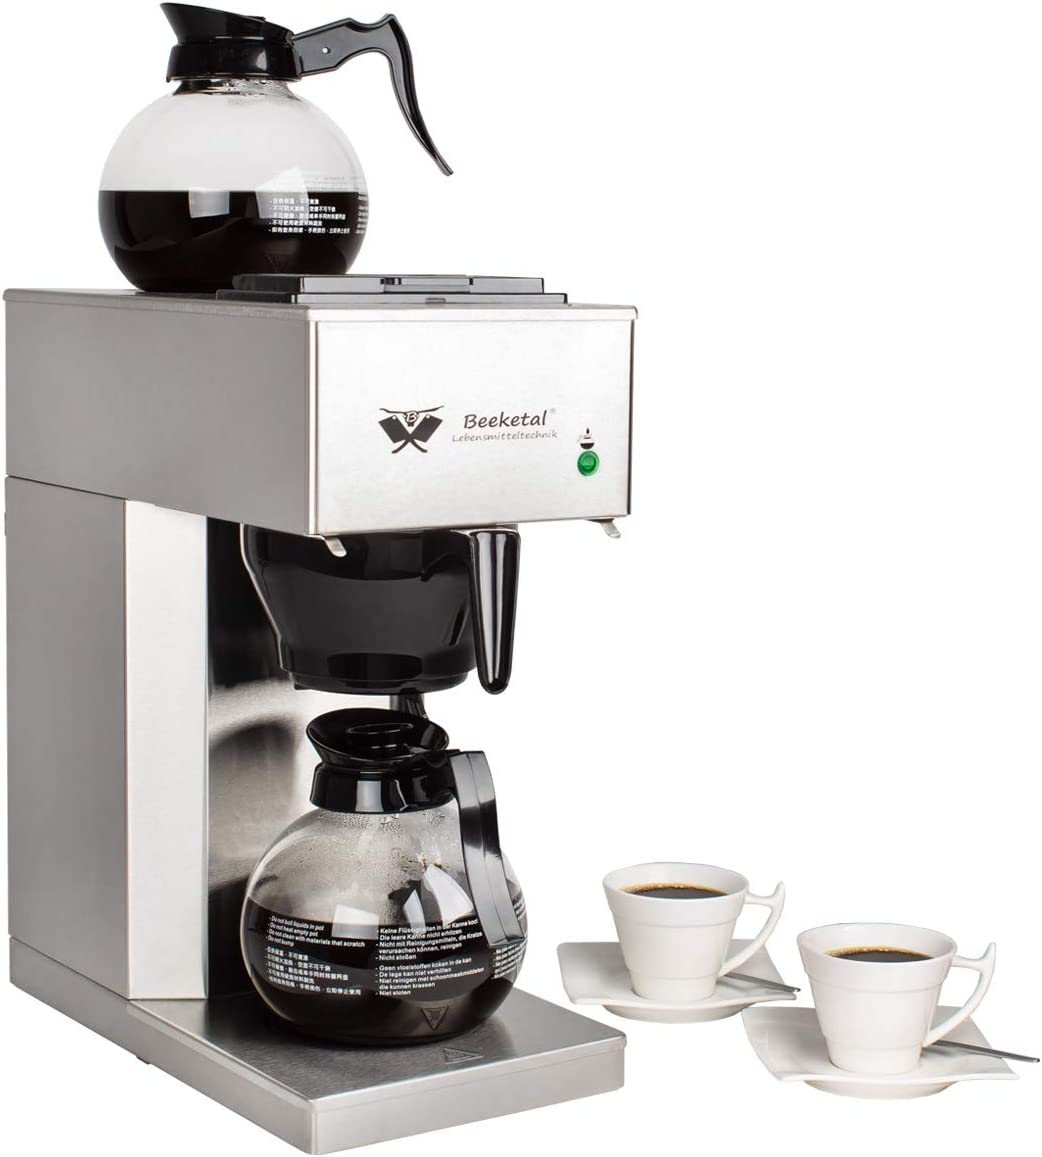 Edelstahl Filterkaffeemaschine - Büro Kaffeemaschine